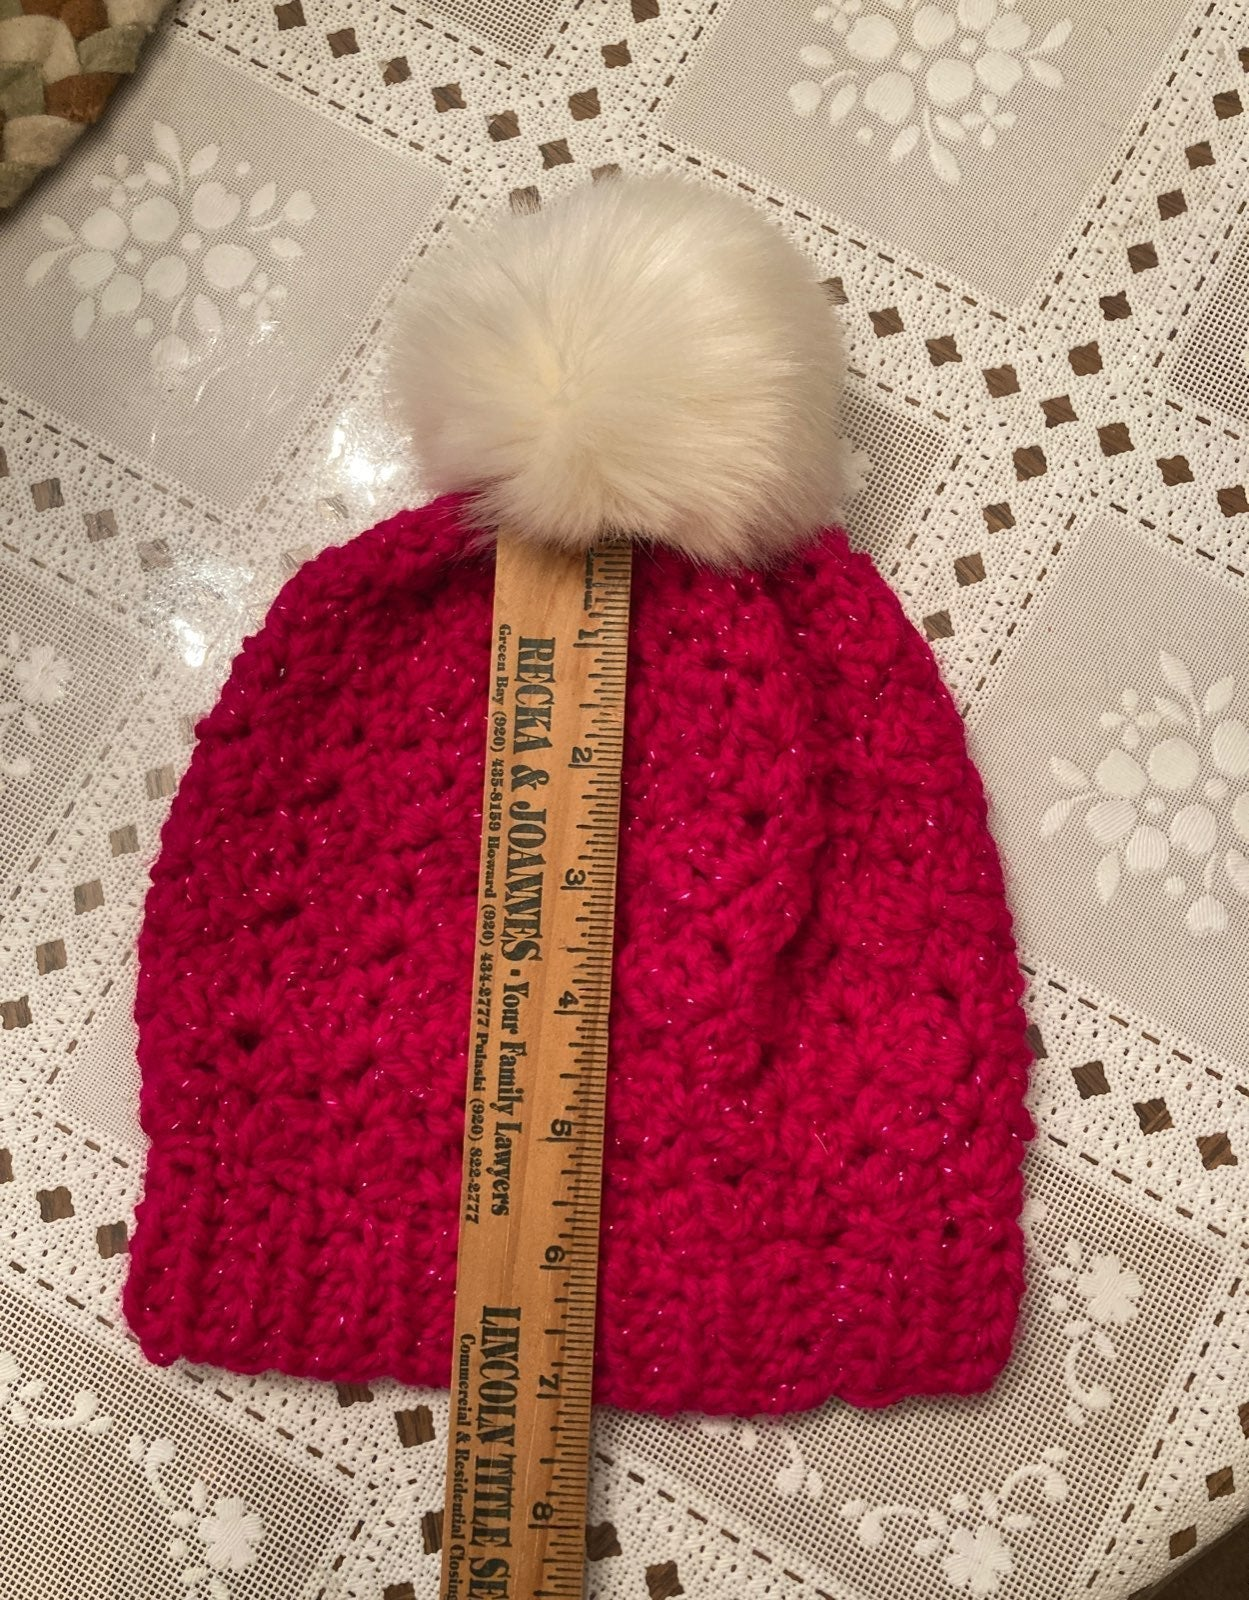 Crocheted handmade hat.